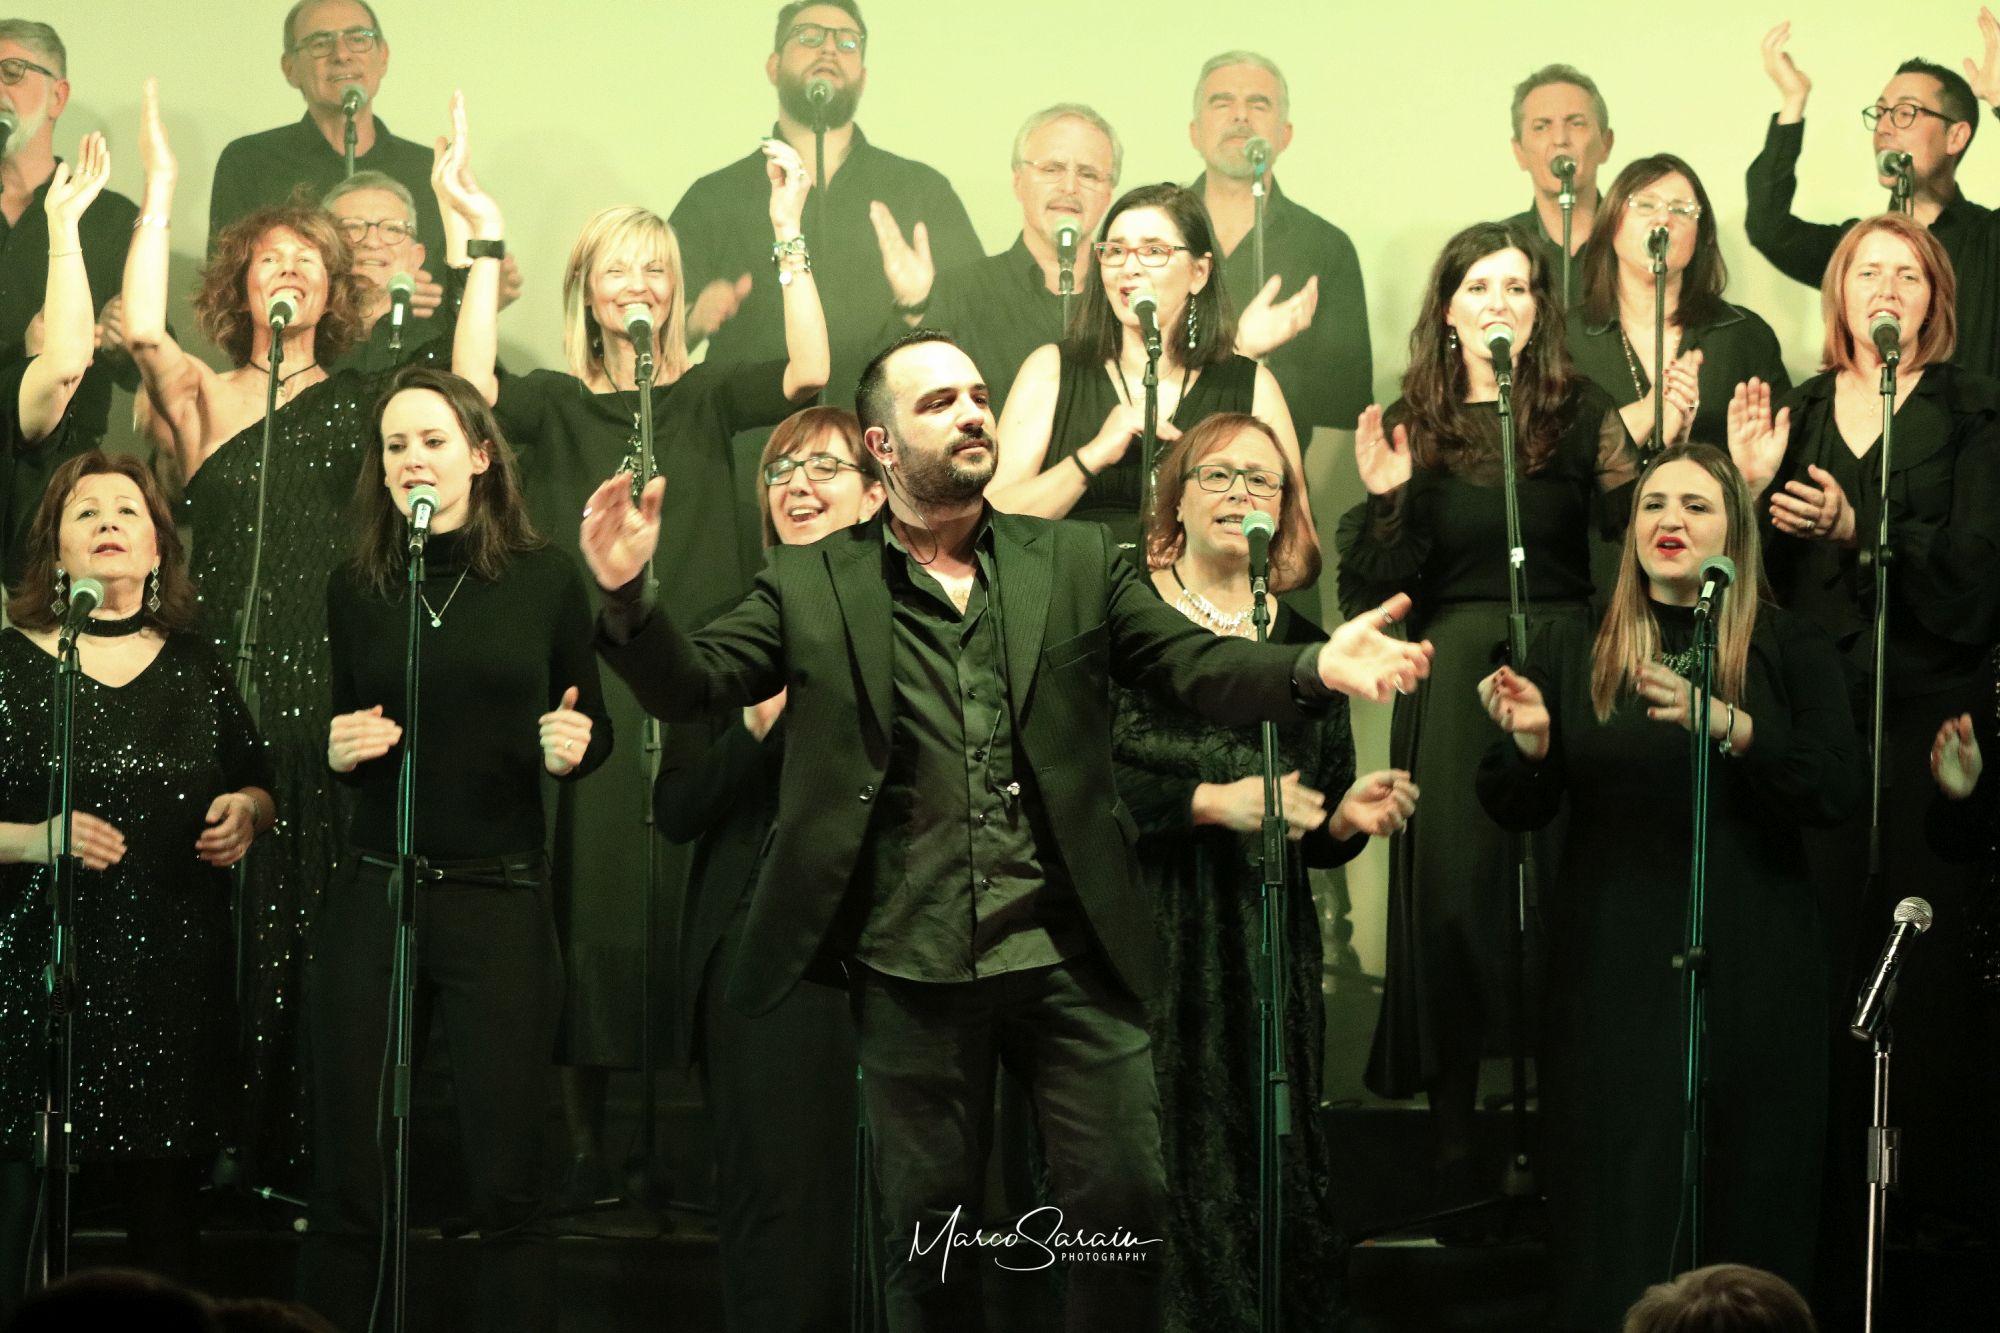 Voiceinsoul Choir @ Centro Culturale Aldo Rossi (Borgoricco) 2020